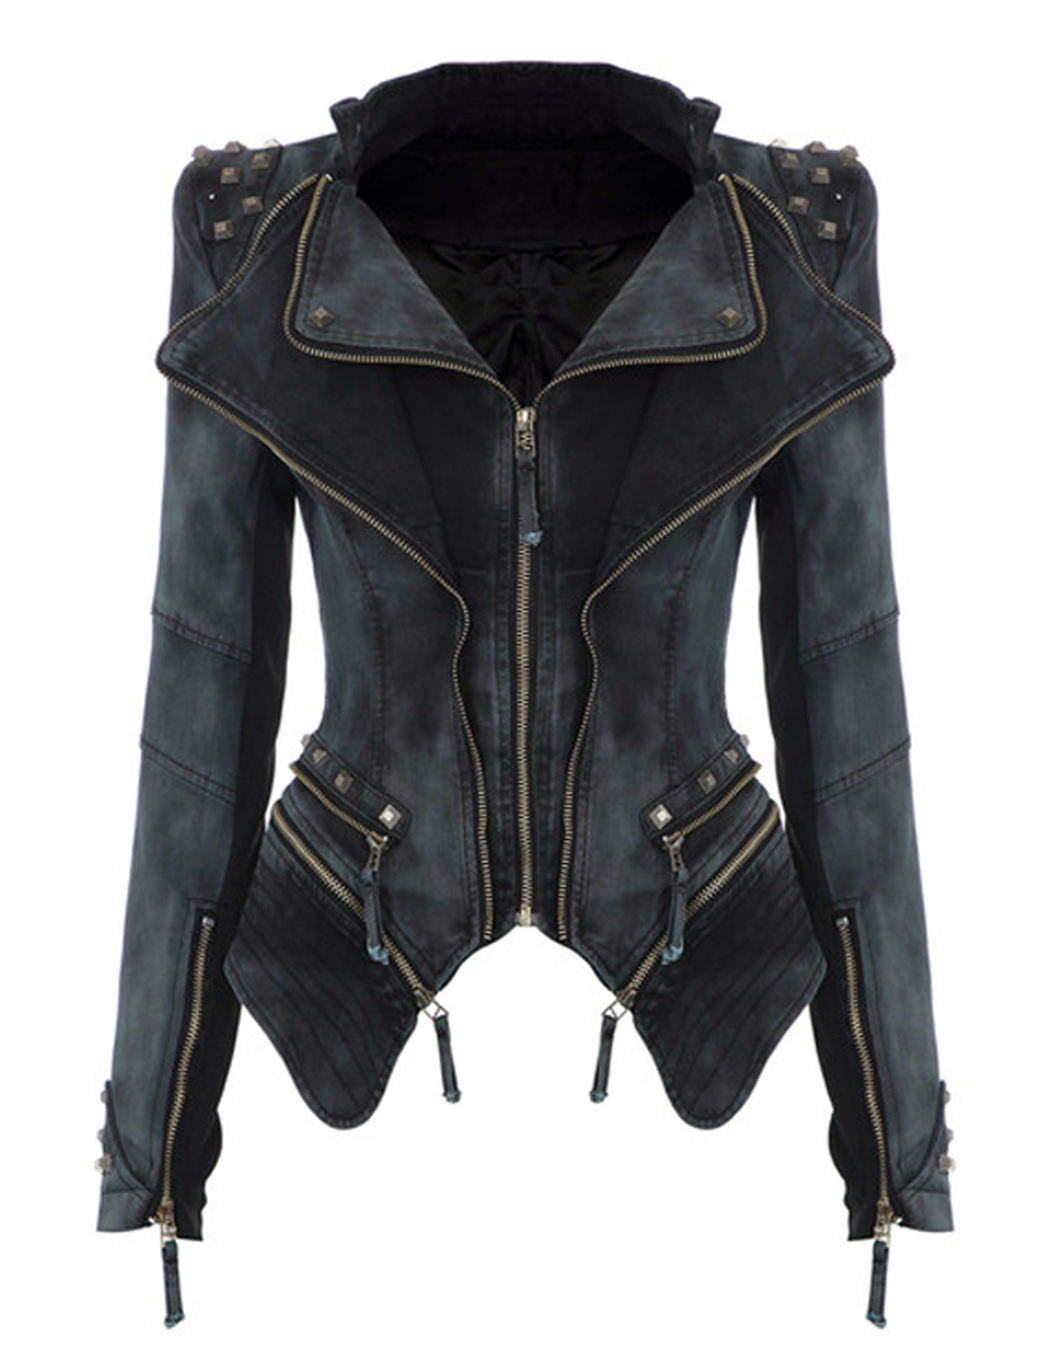 Winter Denim Jacket Women Coat 2017 Vintage Bomber Jackets Rivets Zipper Asymmetrical Hem Full Sleeve Slim Women's Jackets Coats